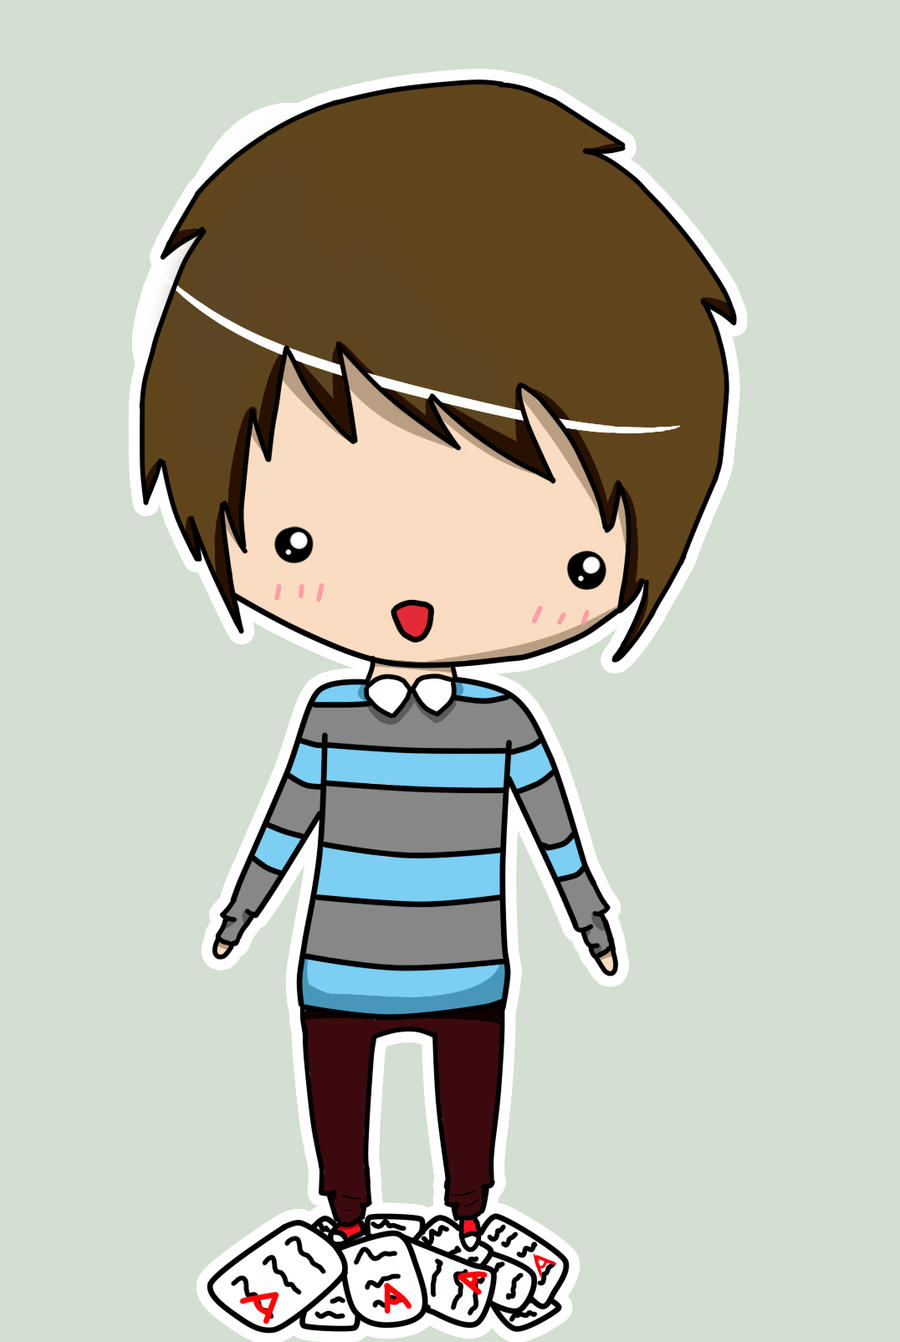 Chibi Boy Nerdie 3 By Darknadin On Deviantart How To Draw A Chibi Boy